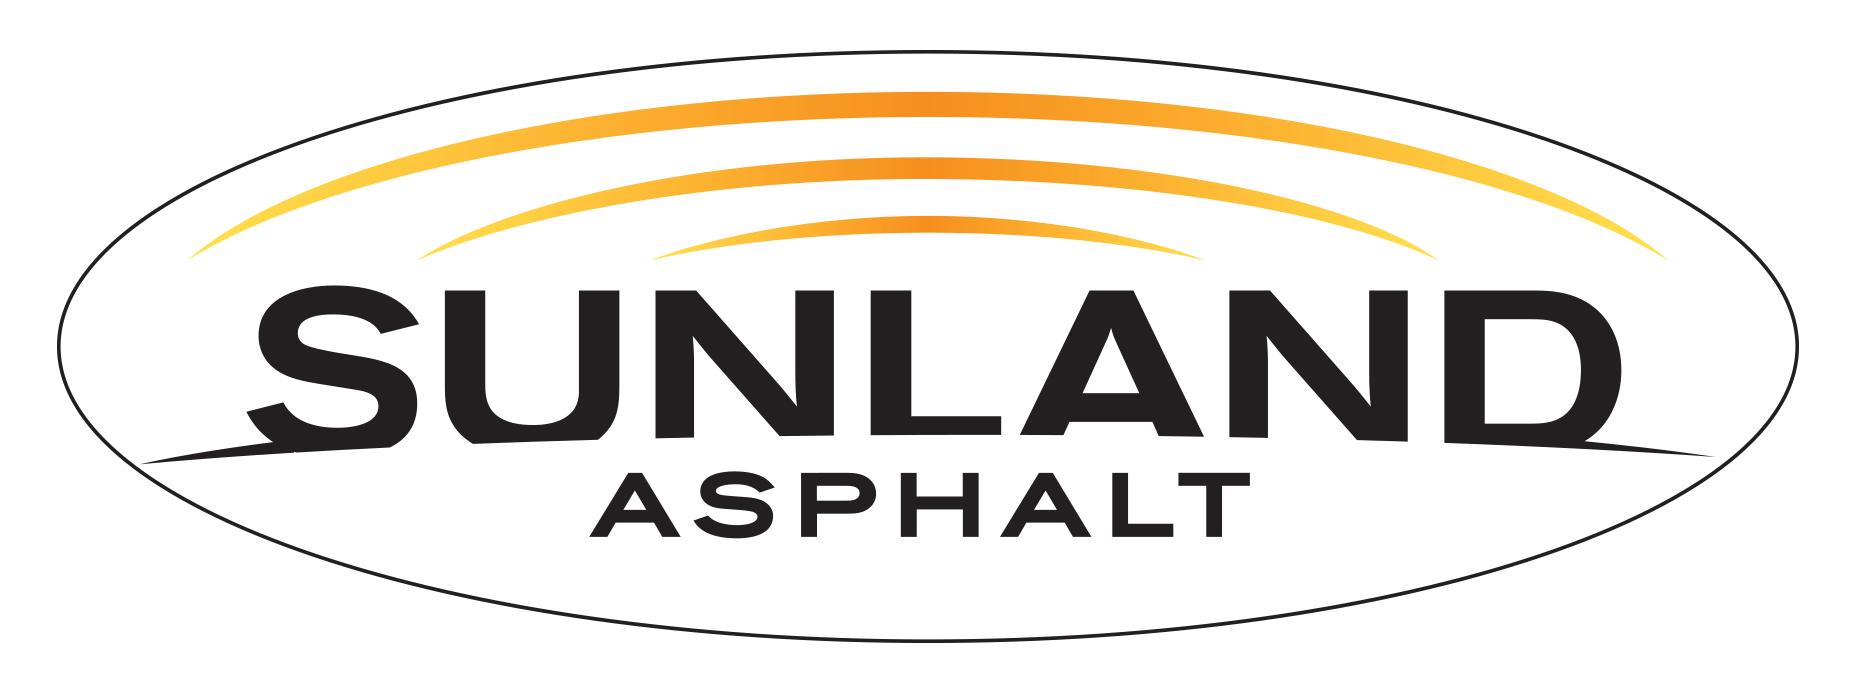 Sunland Asphalt logo.jpg